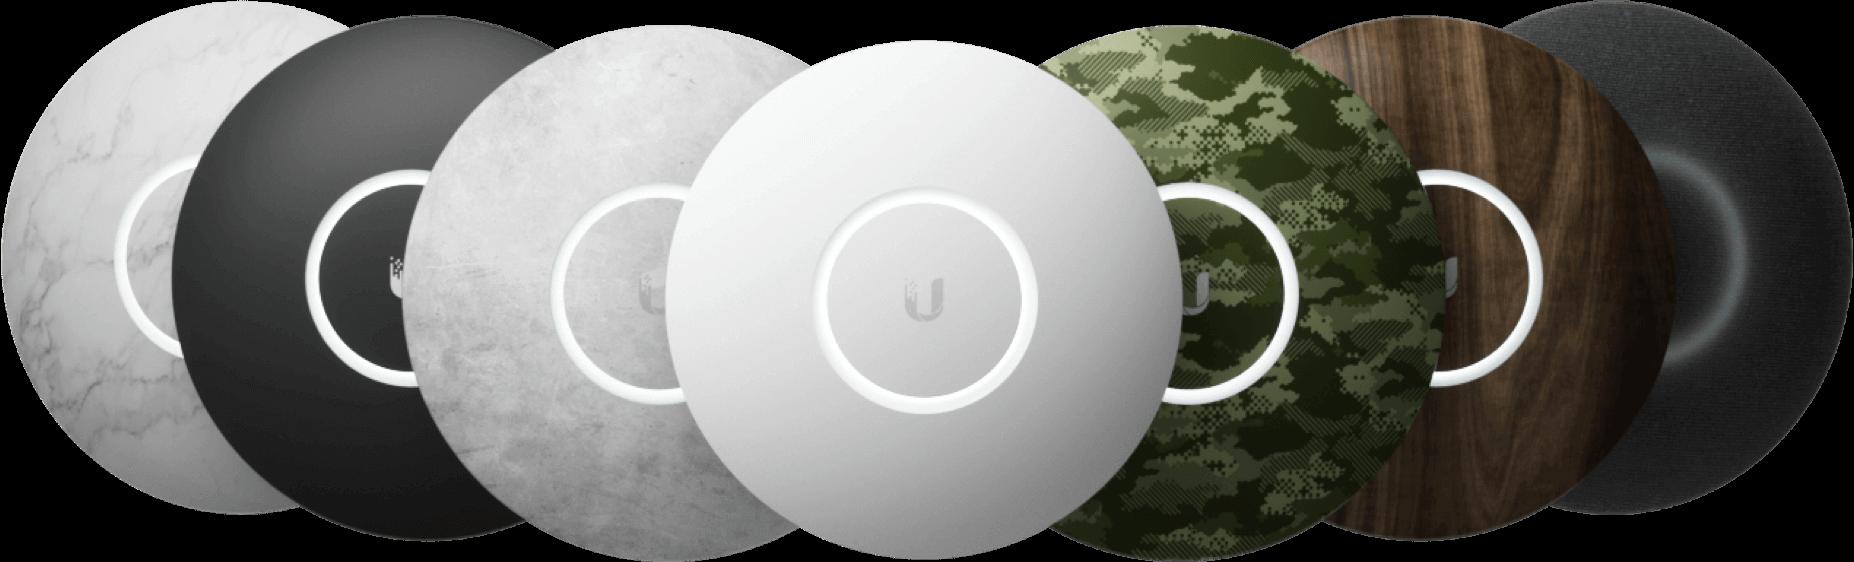 Ubiquiti | UniFi nanoHD | Democratizing Enterprise Wi-Fi Performance